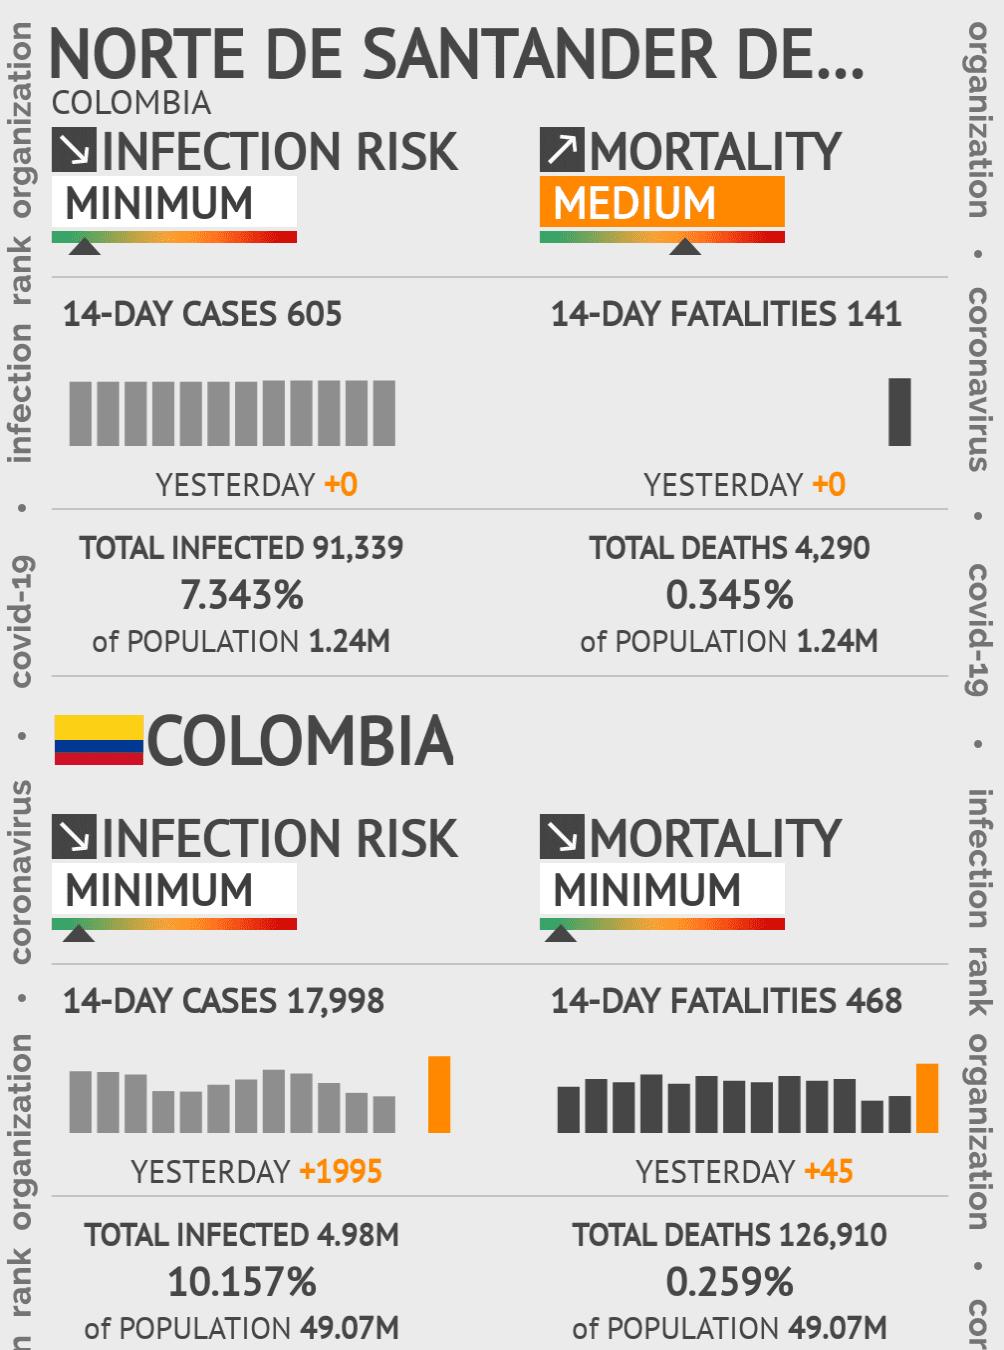 Norte de Santander Coronavirus Covid-19 Risk of Infection on March 06, 2021